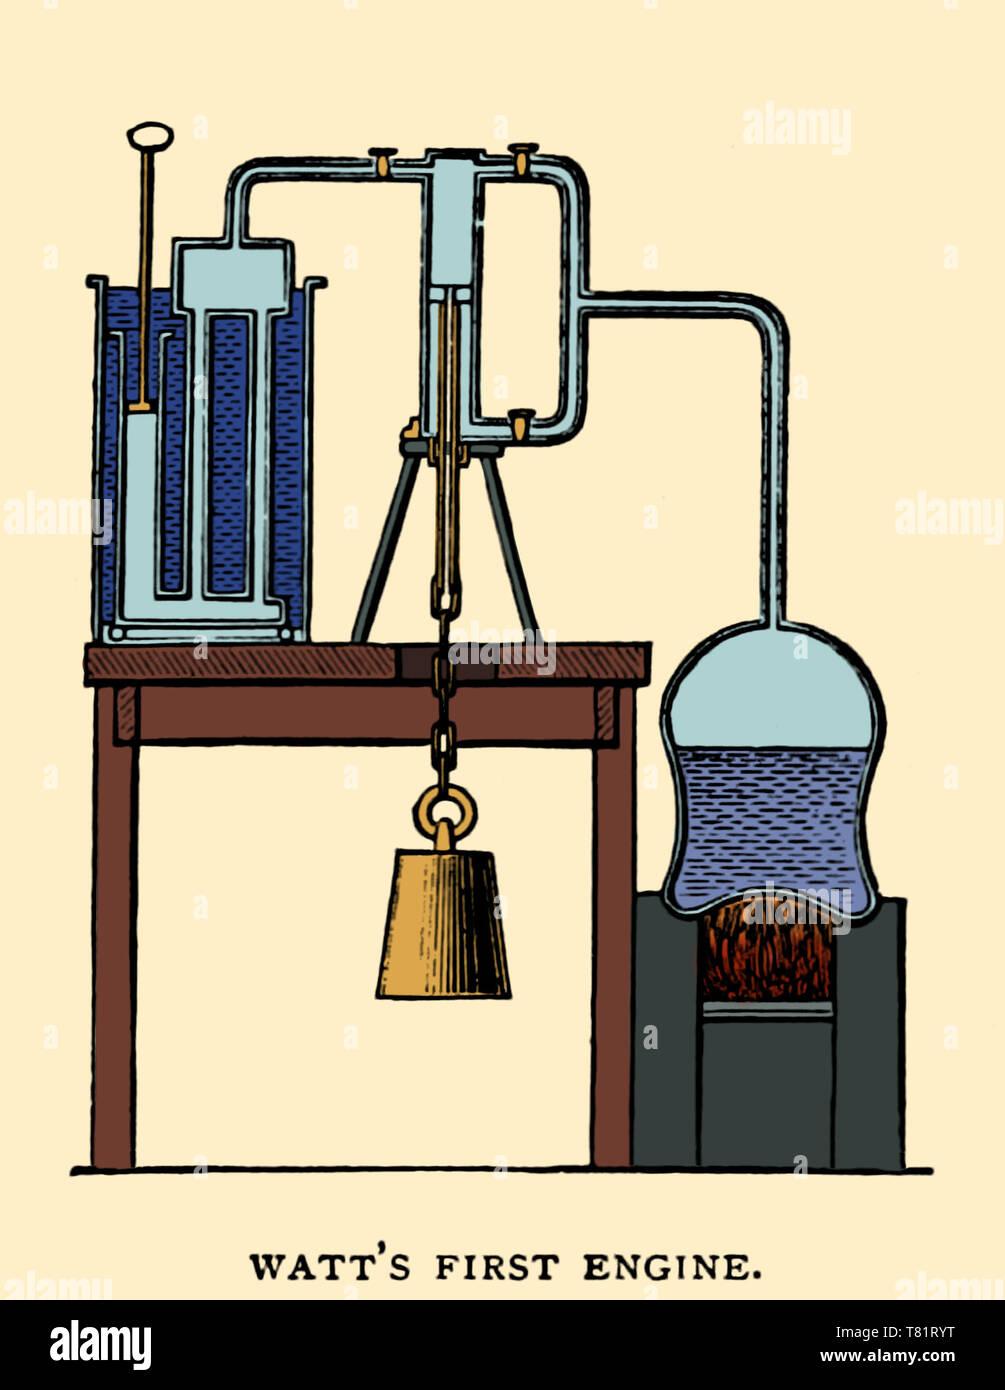 james watt, first steam engine, 18th century - stock image